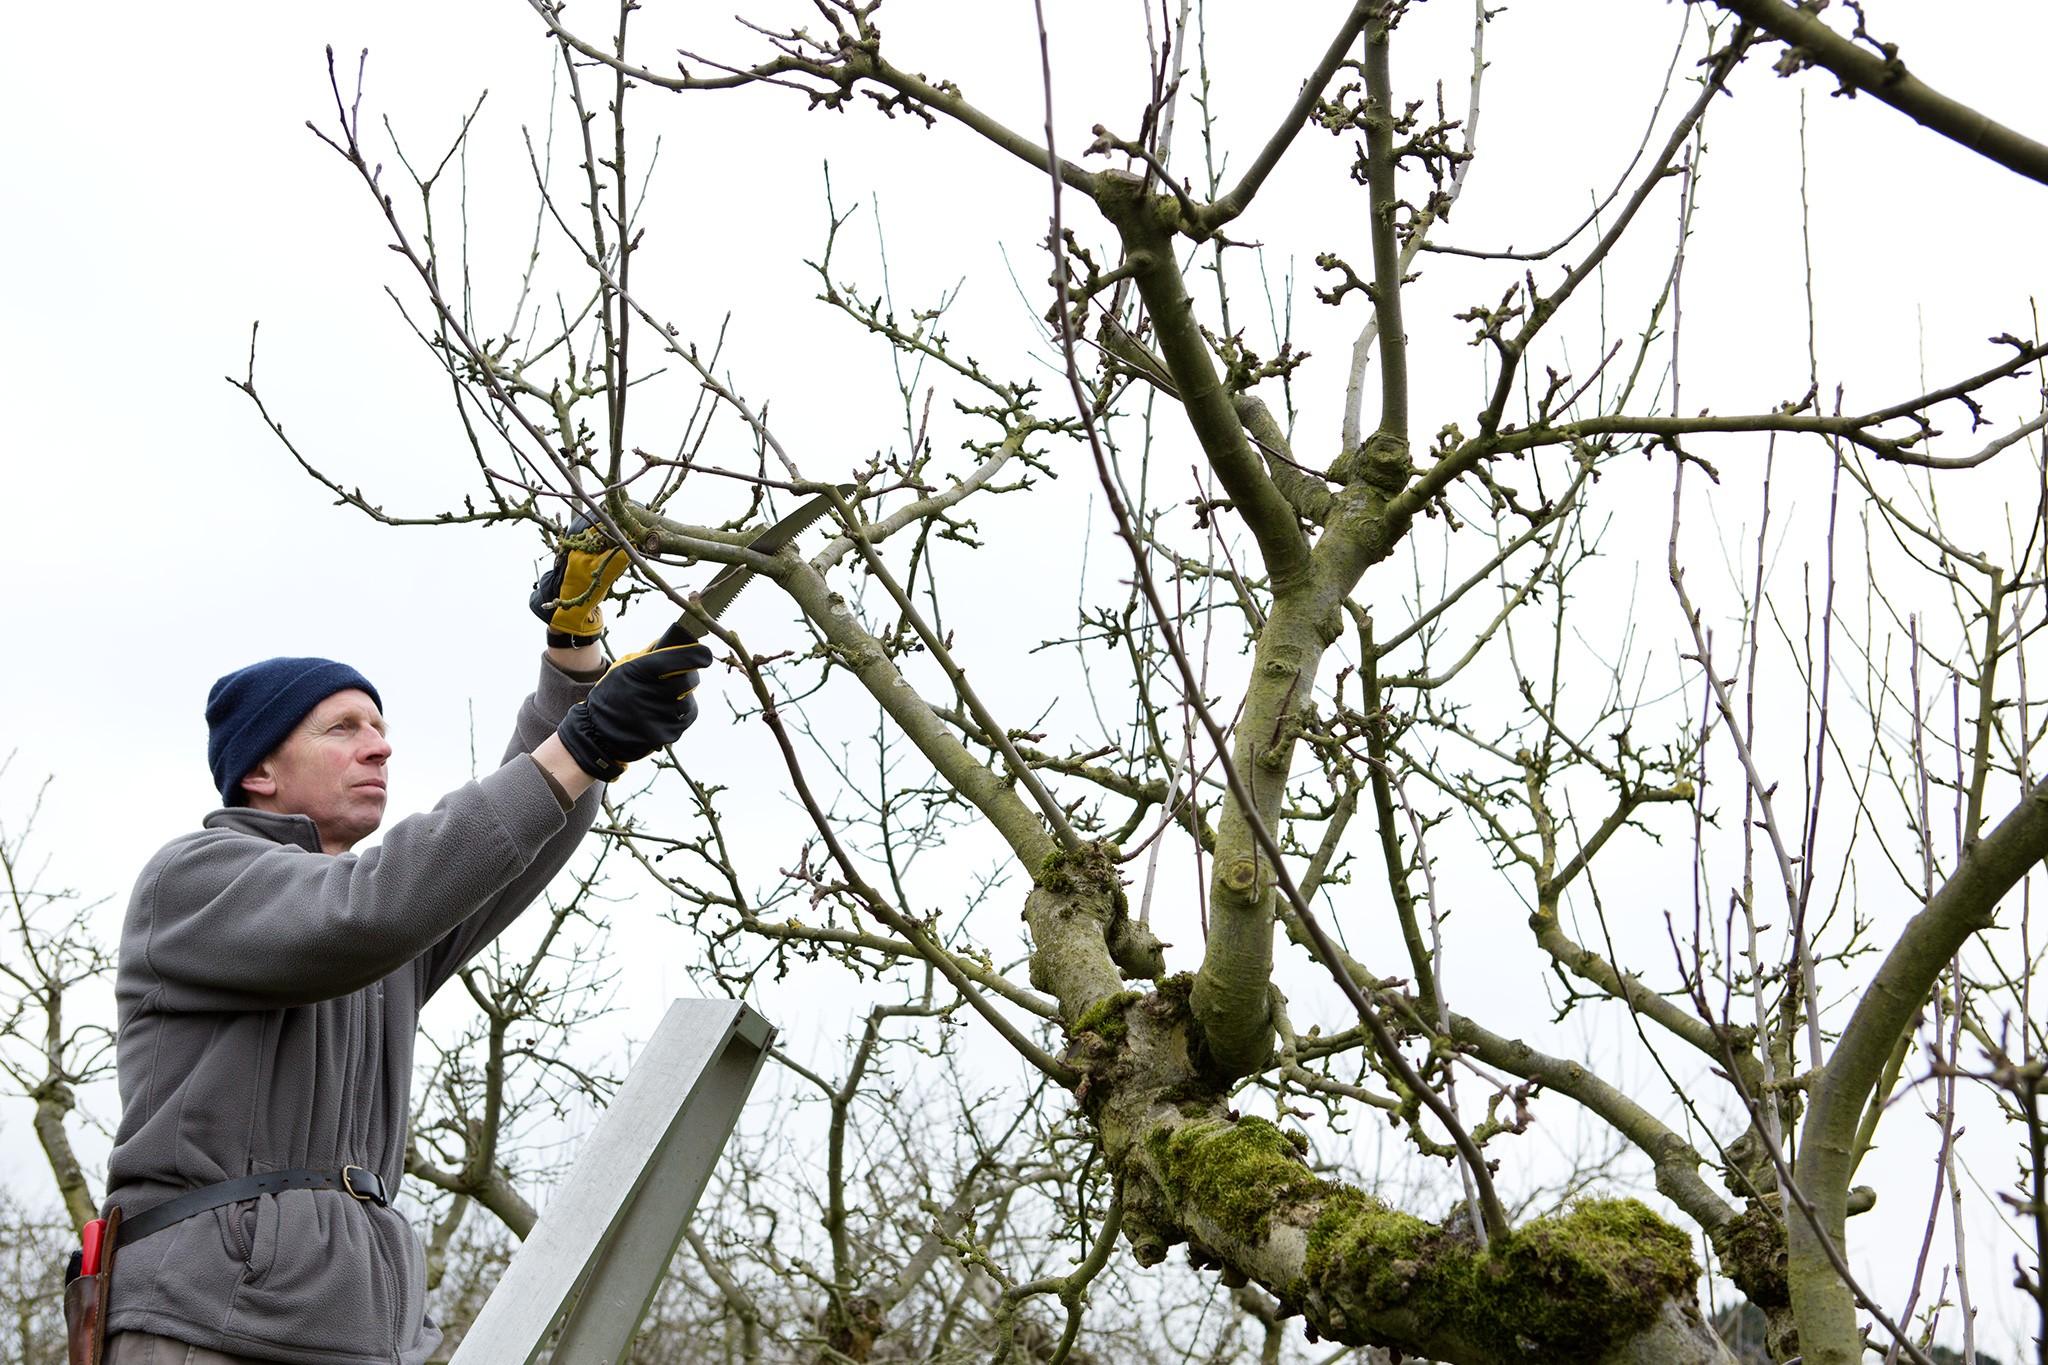 Winter pruning an apple tree